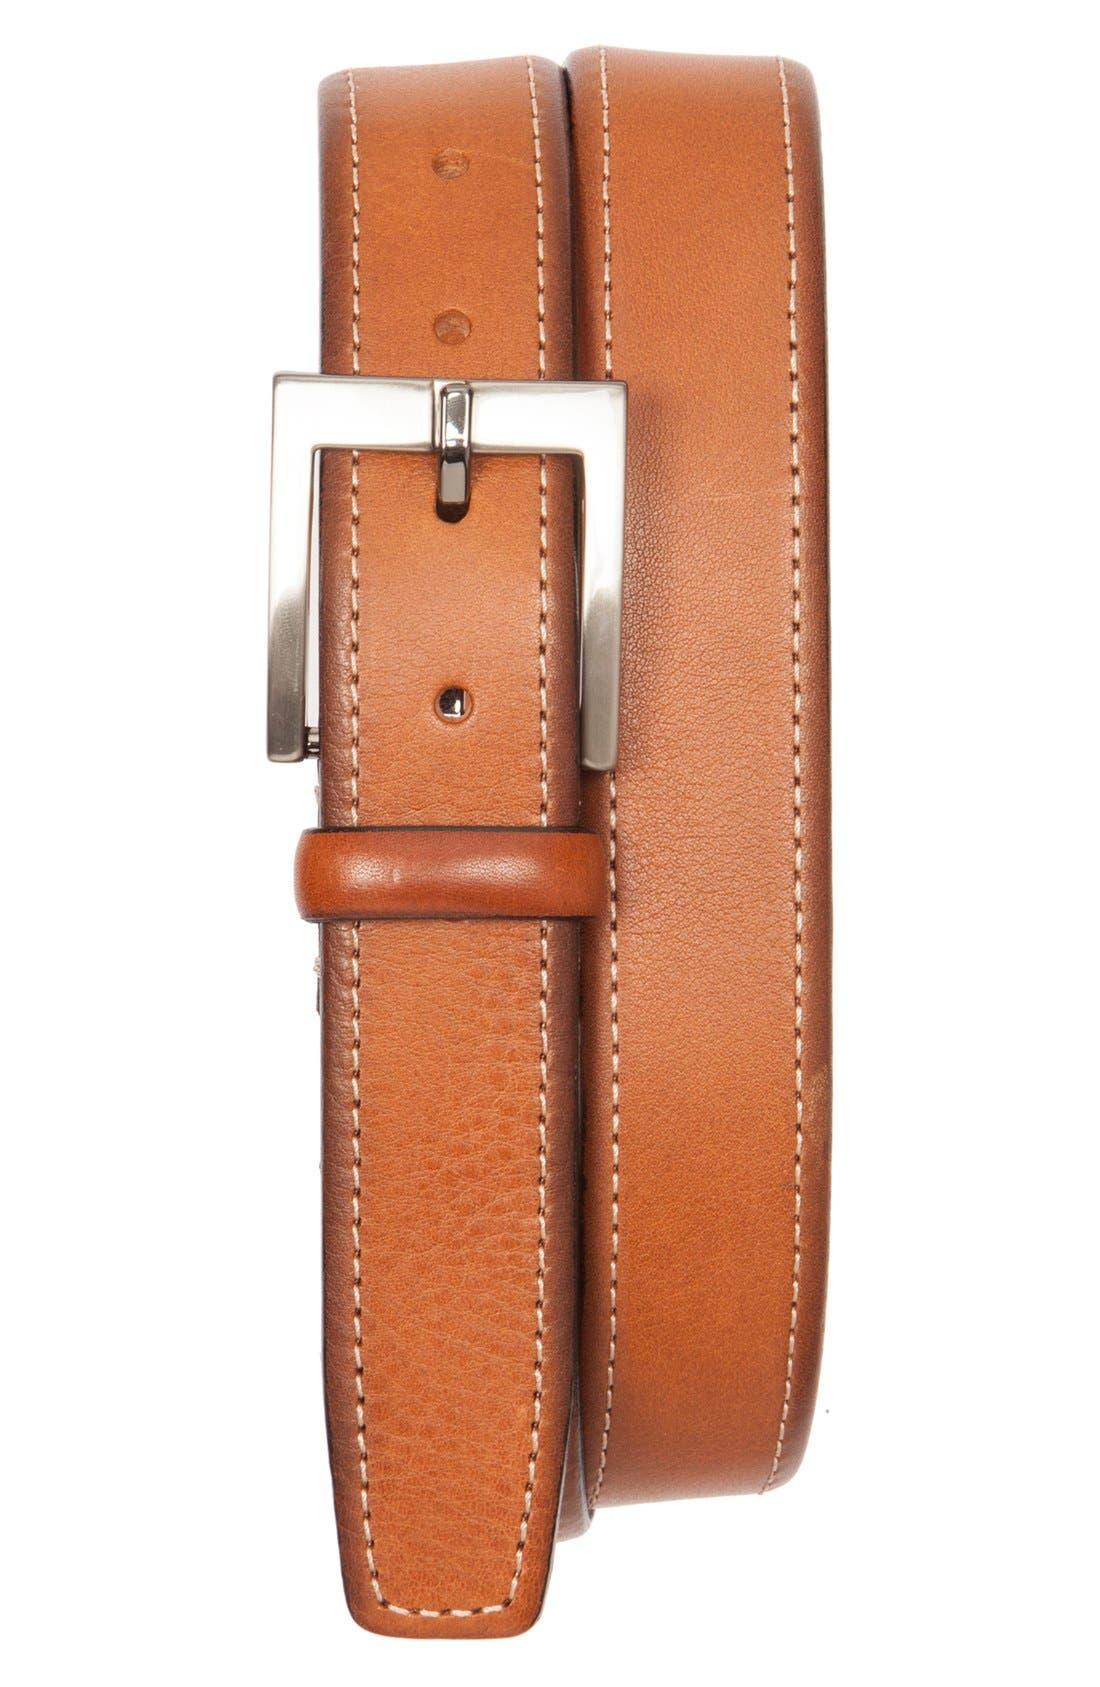 Contrast Stitch Leather Belt,                             Main thumbnail 1, color,                             251